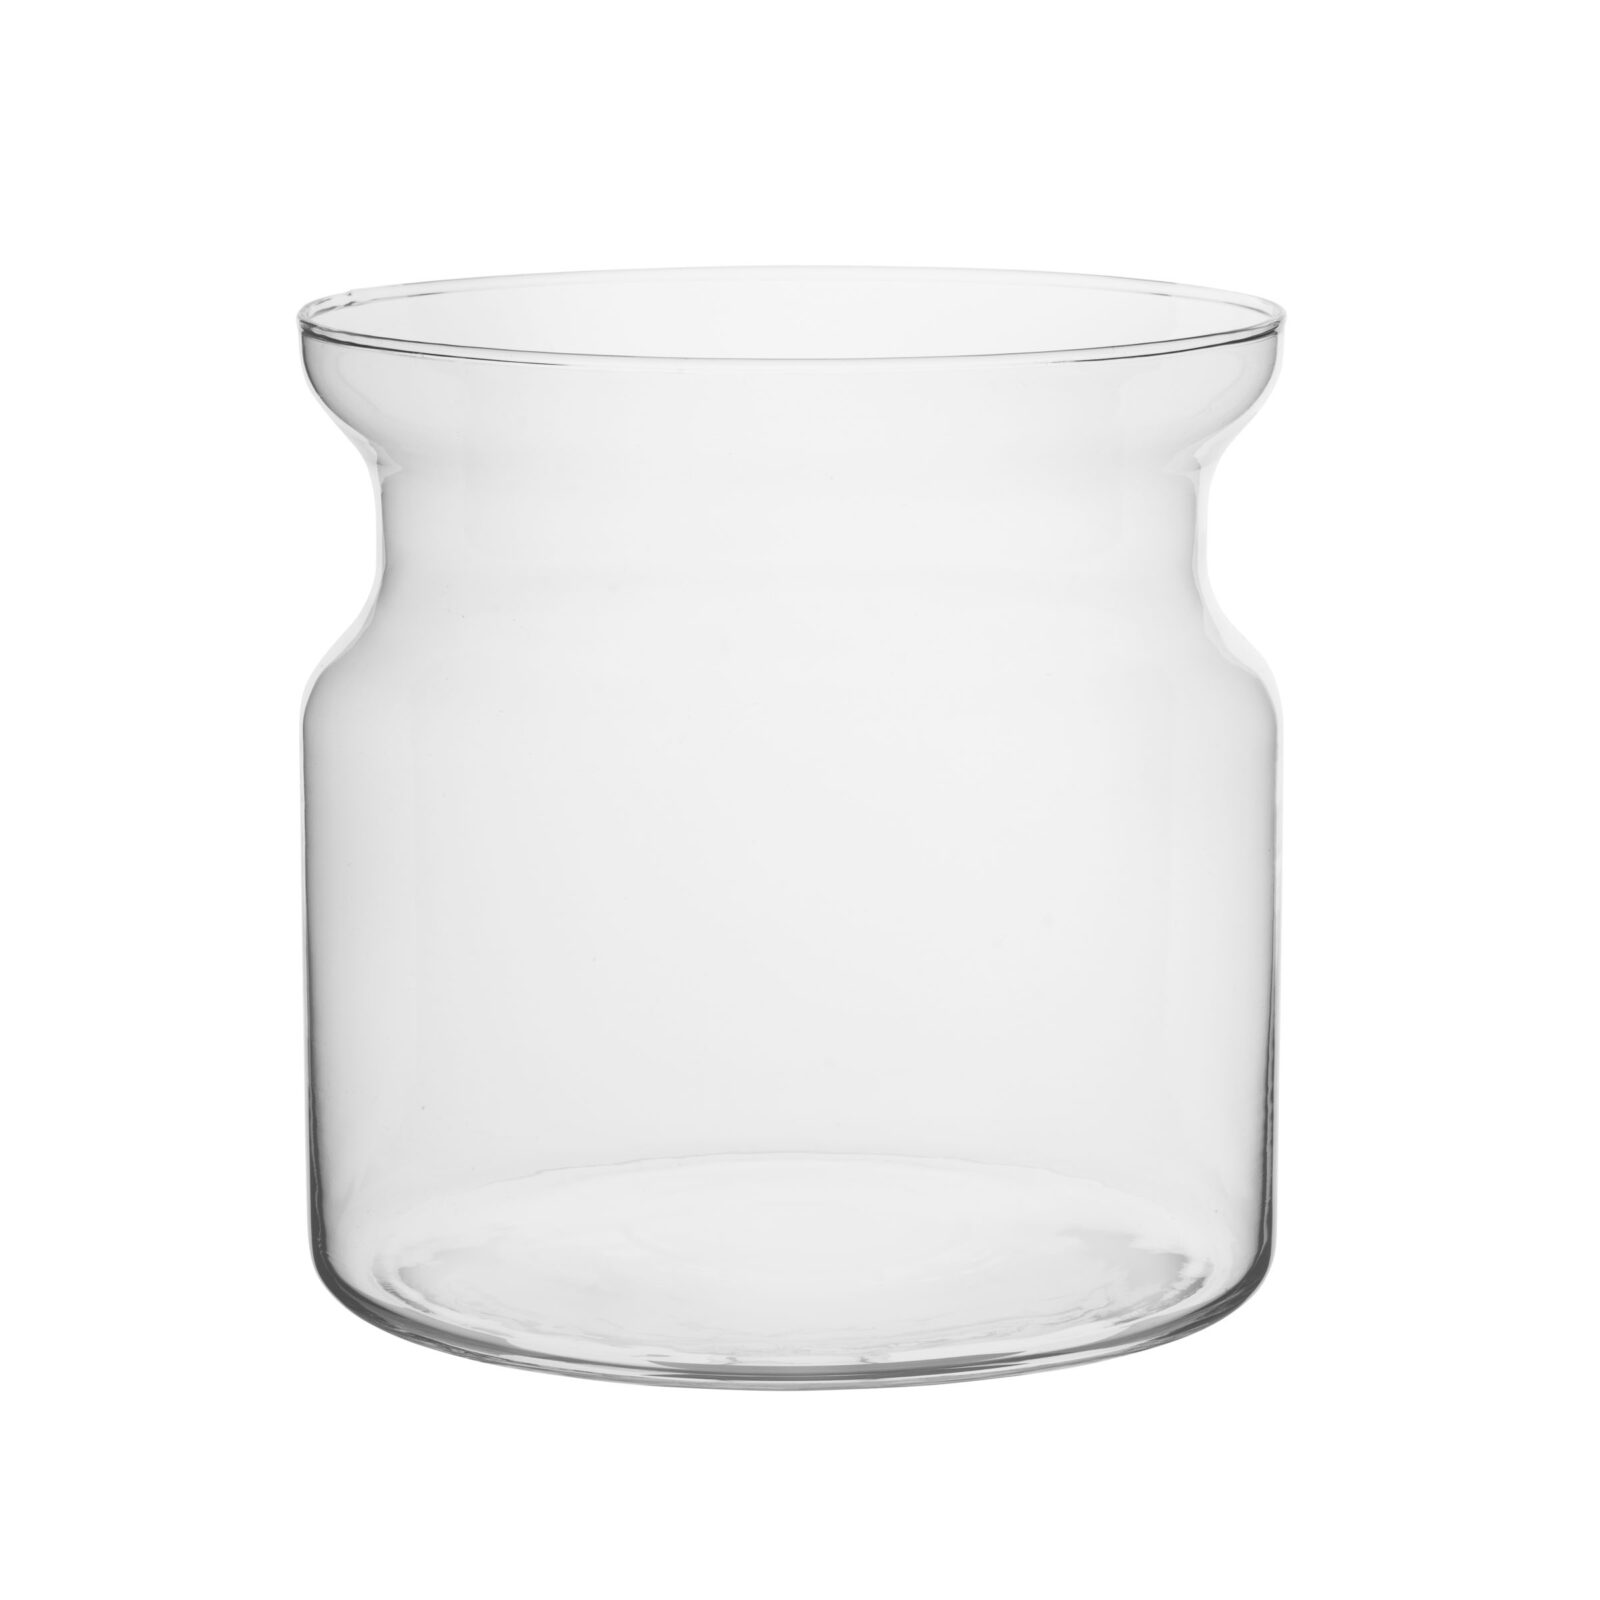 Słój wazon szklany las w słoju terrarium H19 D19